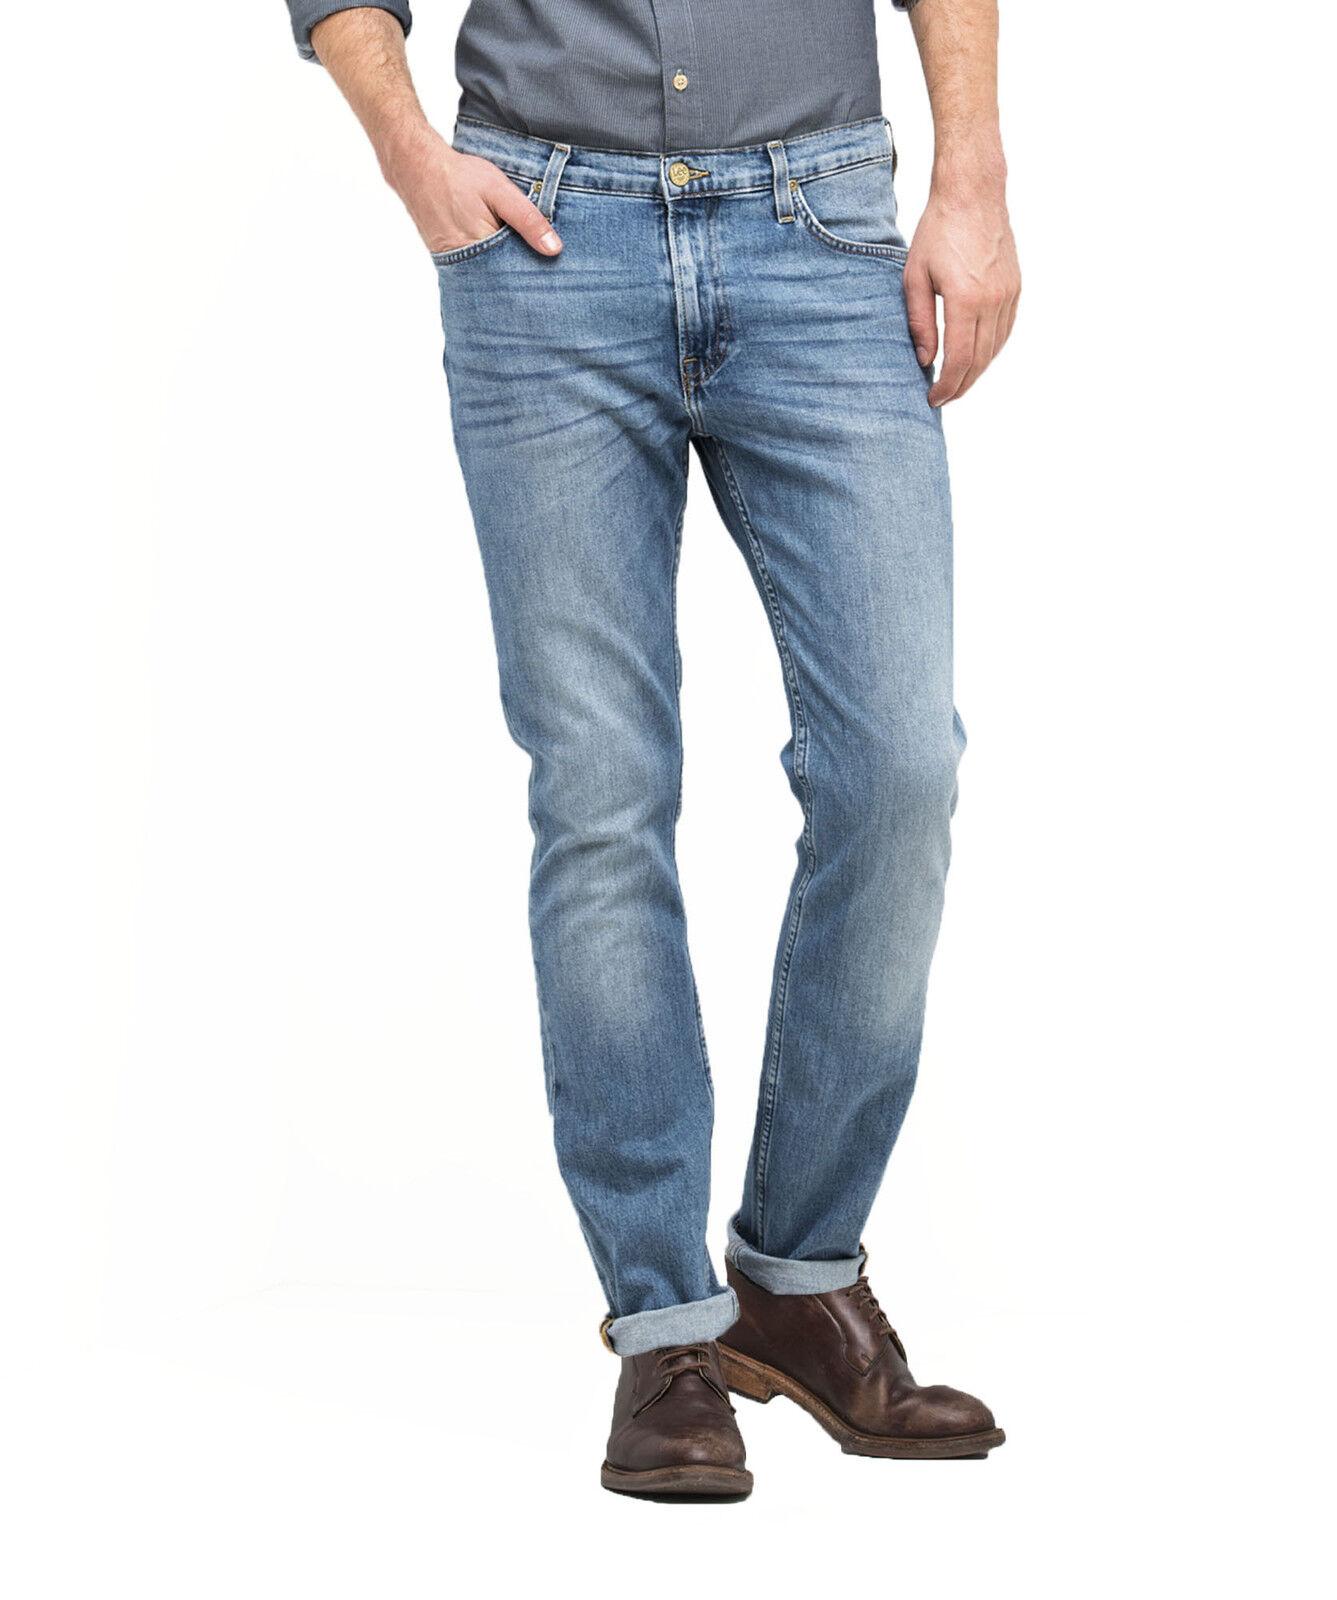 91478ad802dc2 LEE Rider Mens Regular Waist Tapered Slim Leg Stretch Denim Jeans Light  Shade